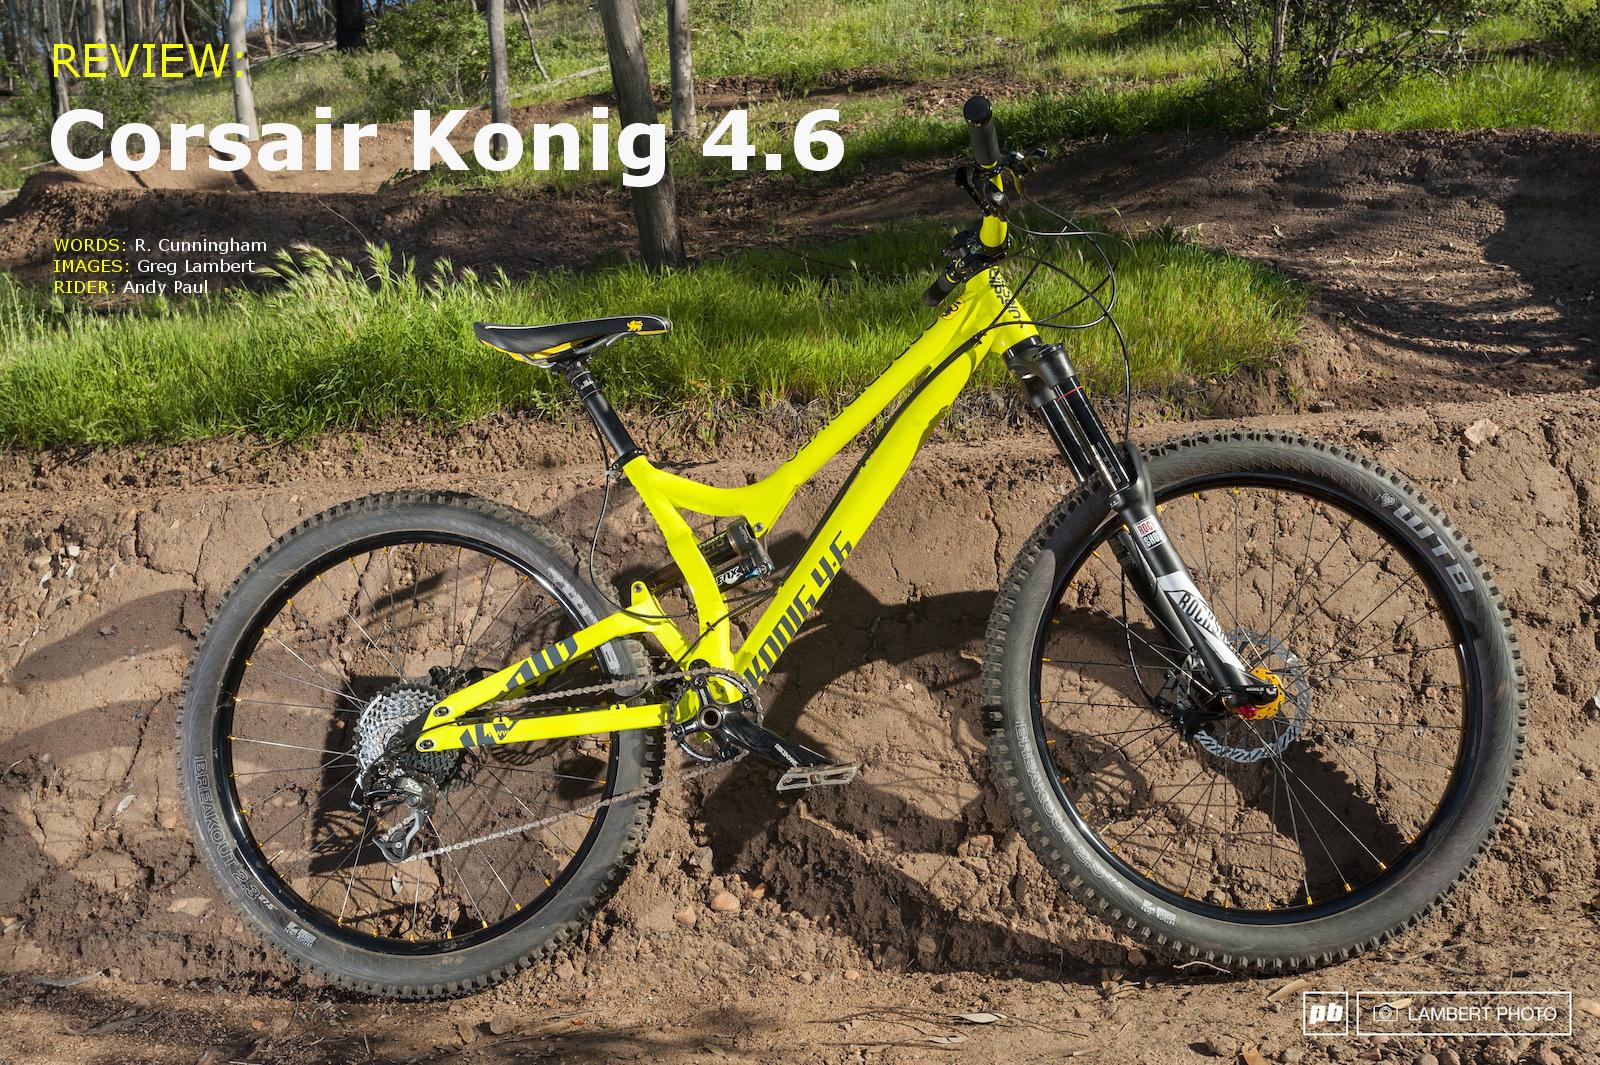 Corsair Konig 4.6 - Review - Pinkbike